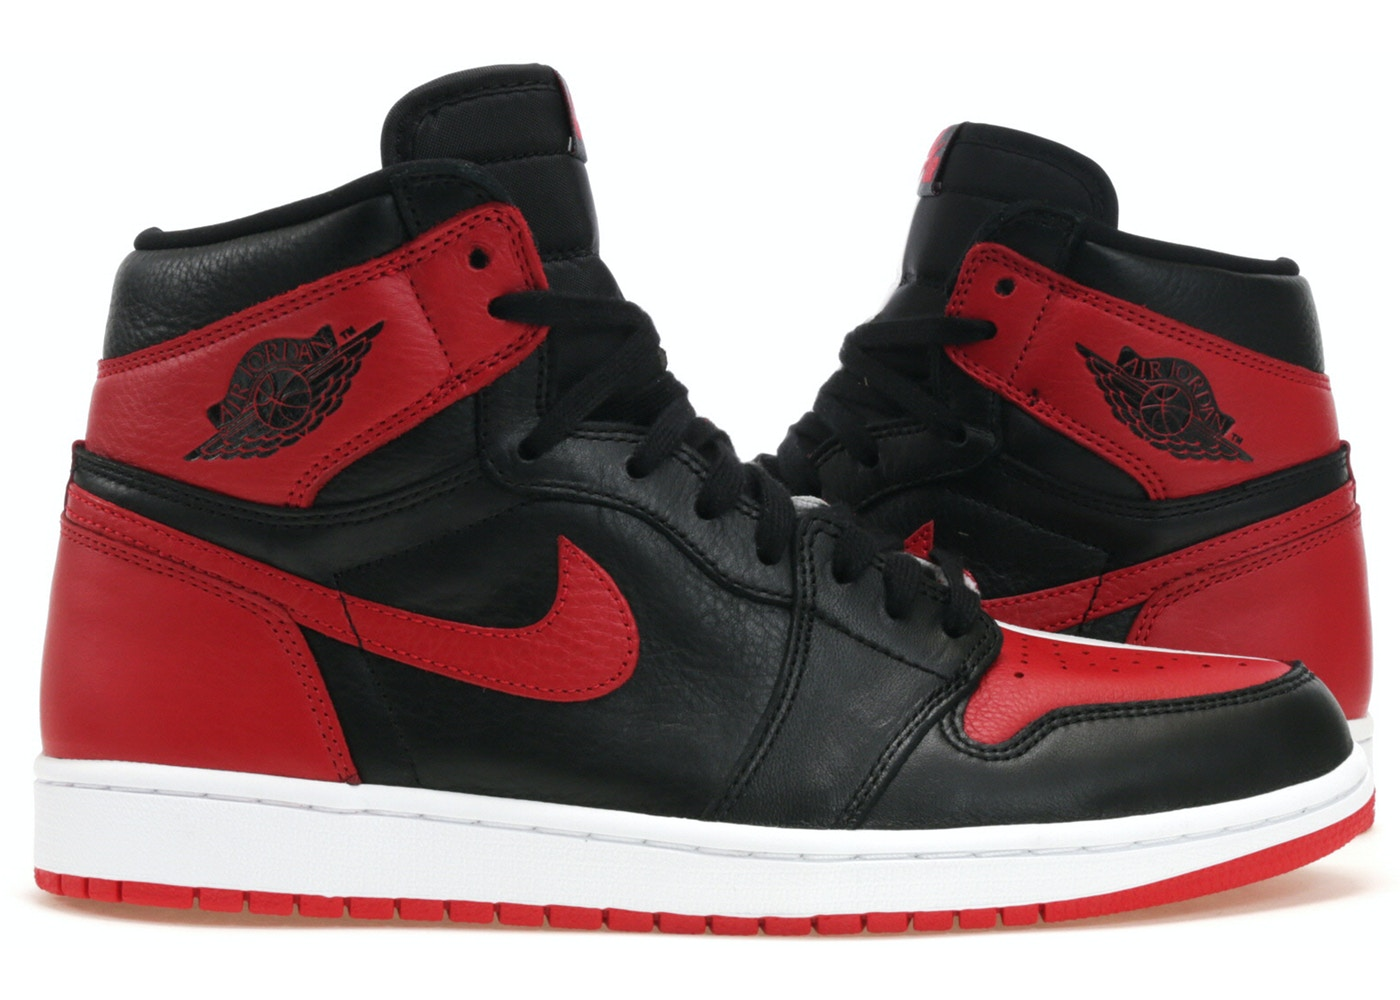 cheap for discount 208fb 64d93 Air Jordan 1 Size 14 Shoes - Average Sale Price